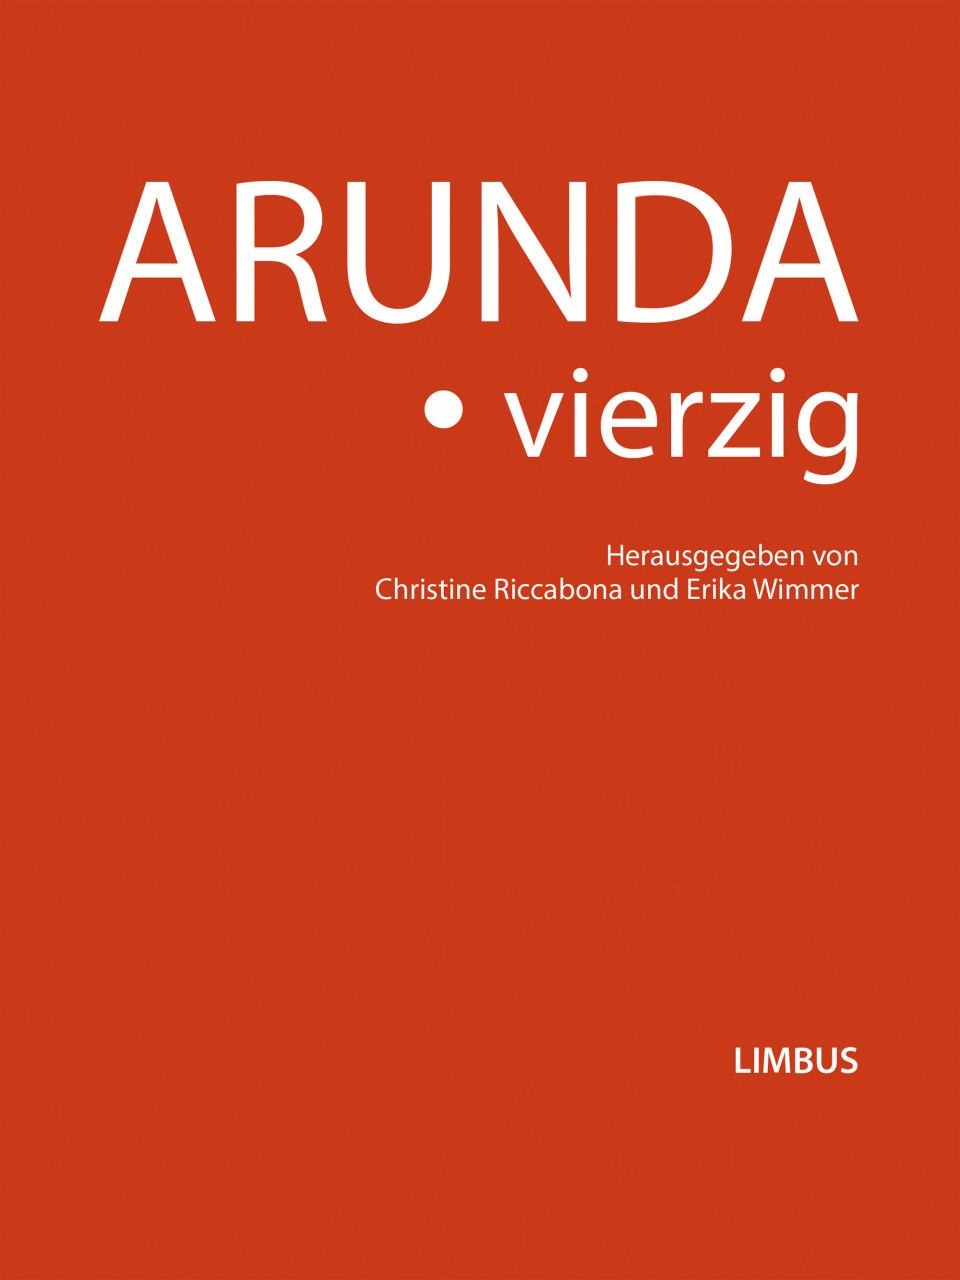 aruna_cover_druck_down.jpg